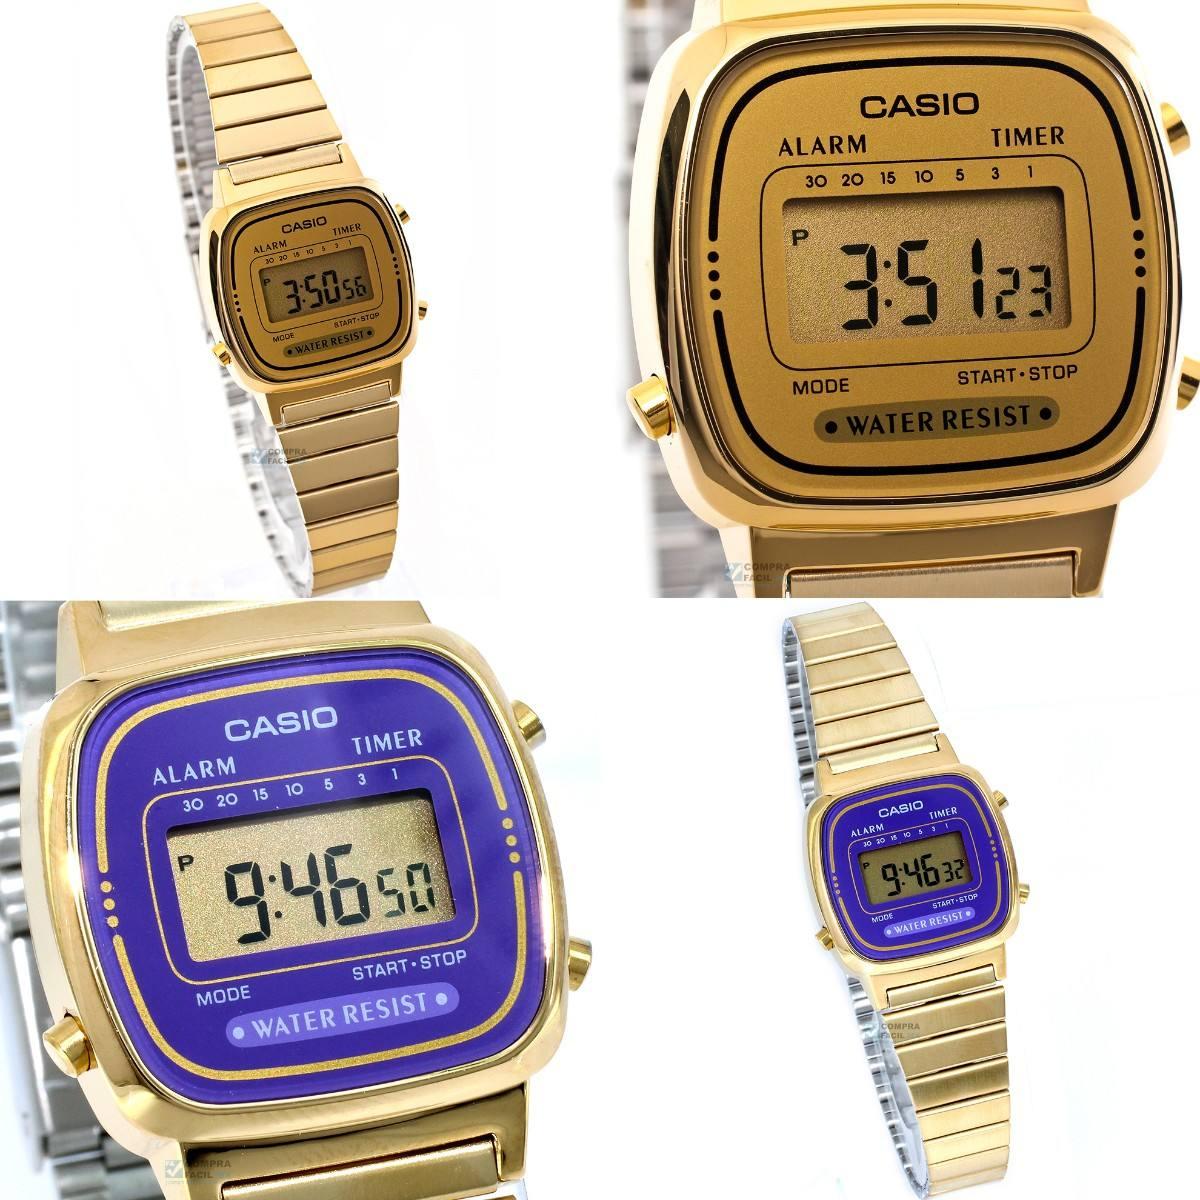 7961847e882d reloj casio la670 dorado retro vintage para dama - cfmx. Cargando zoom.